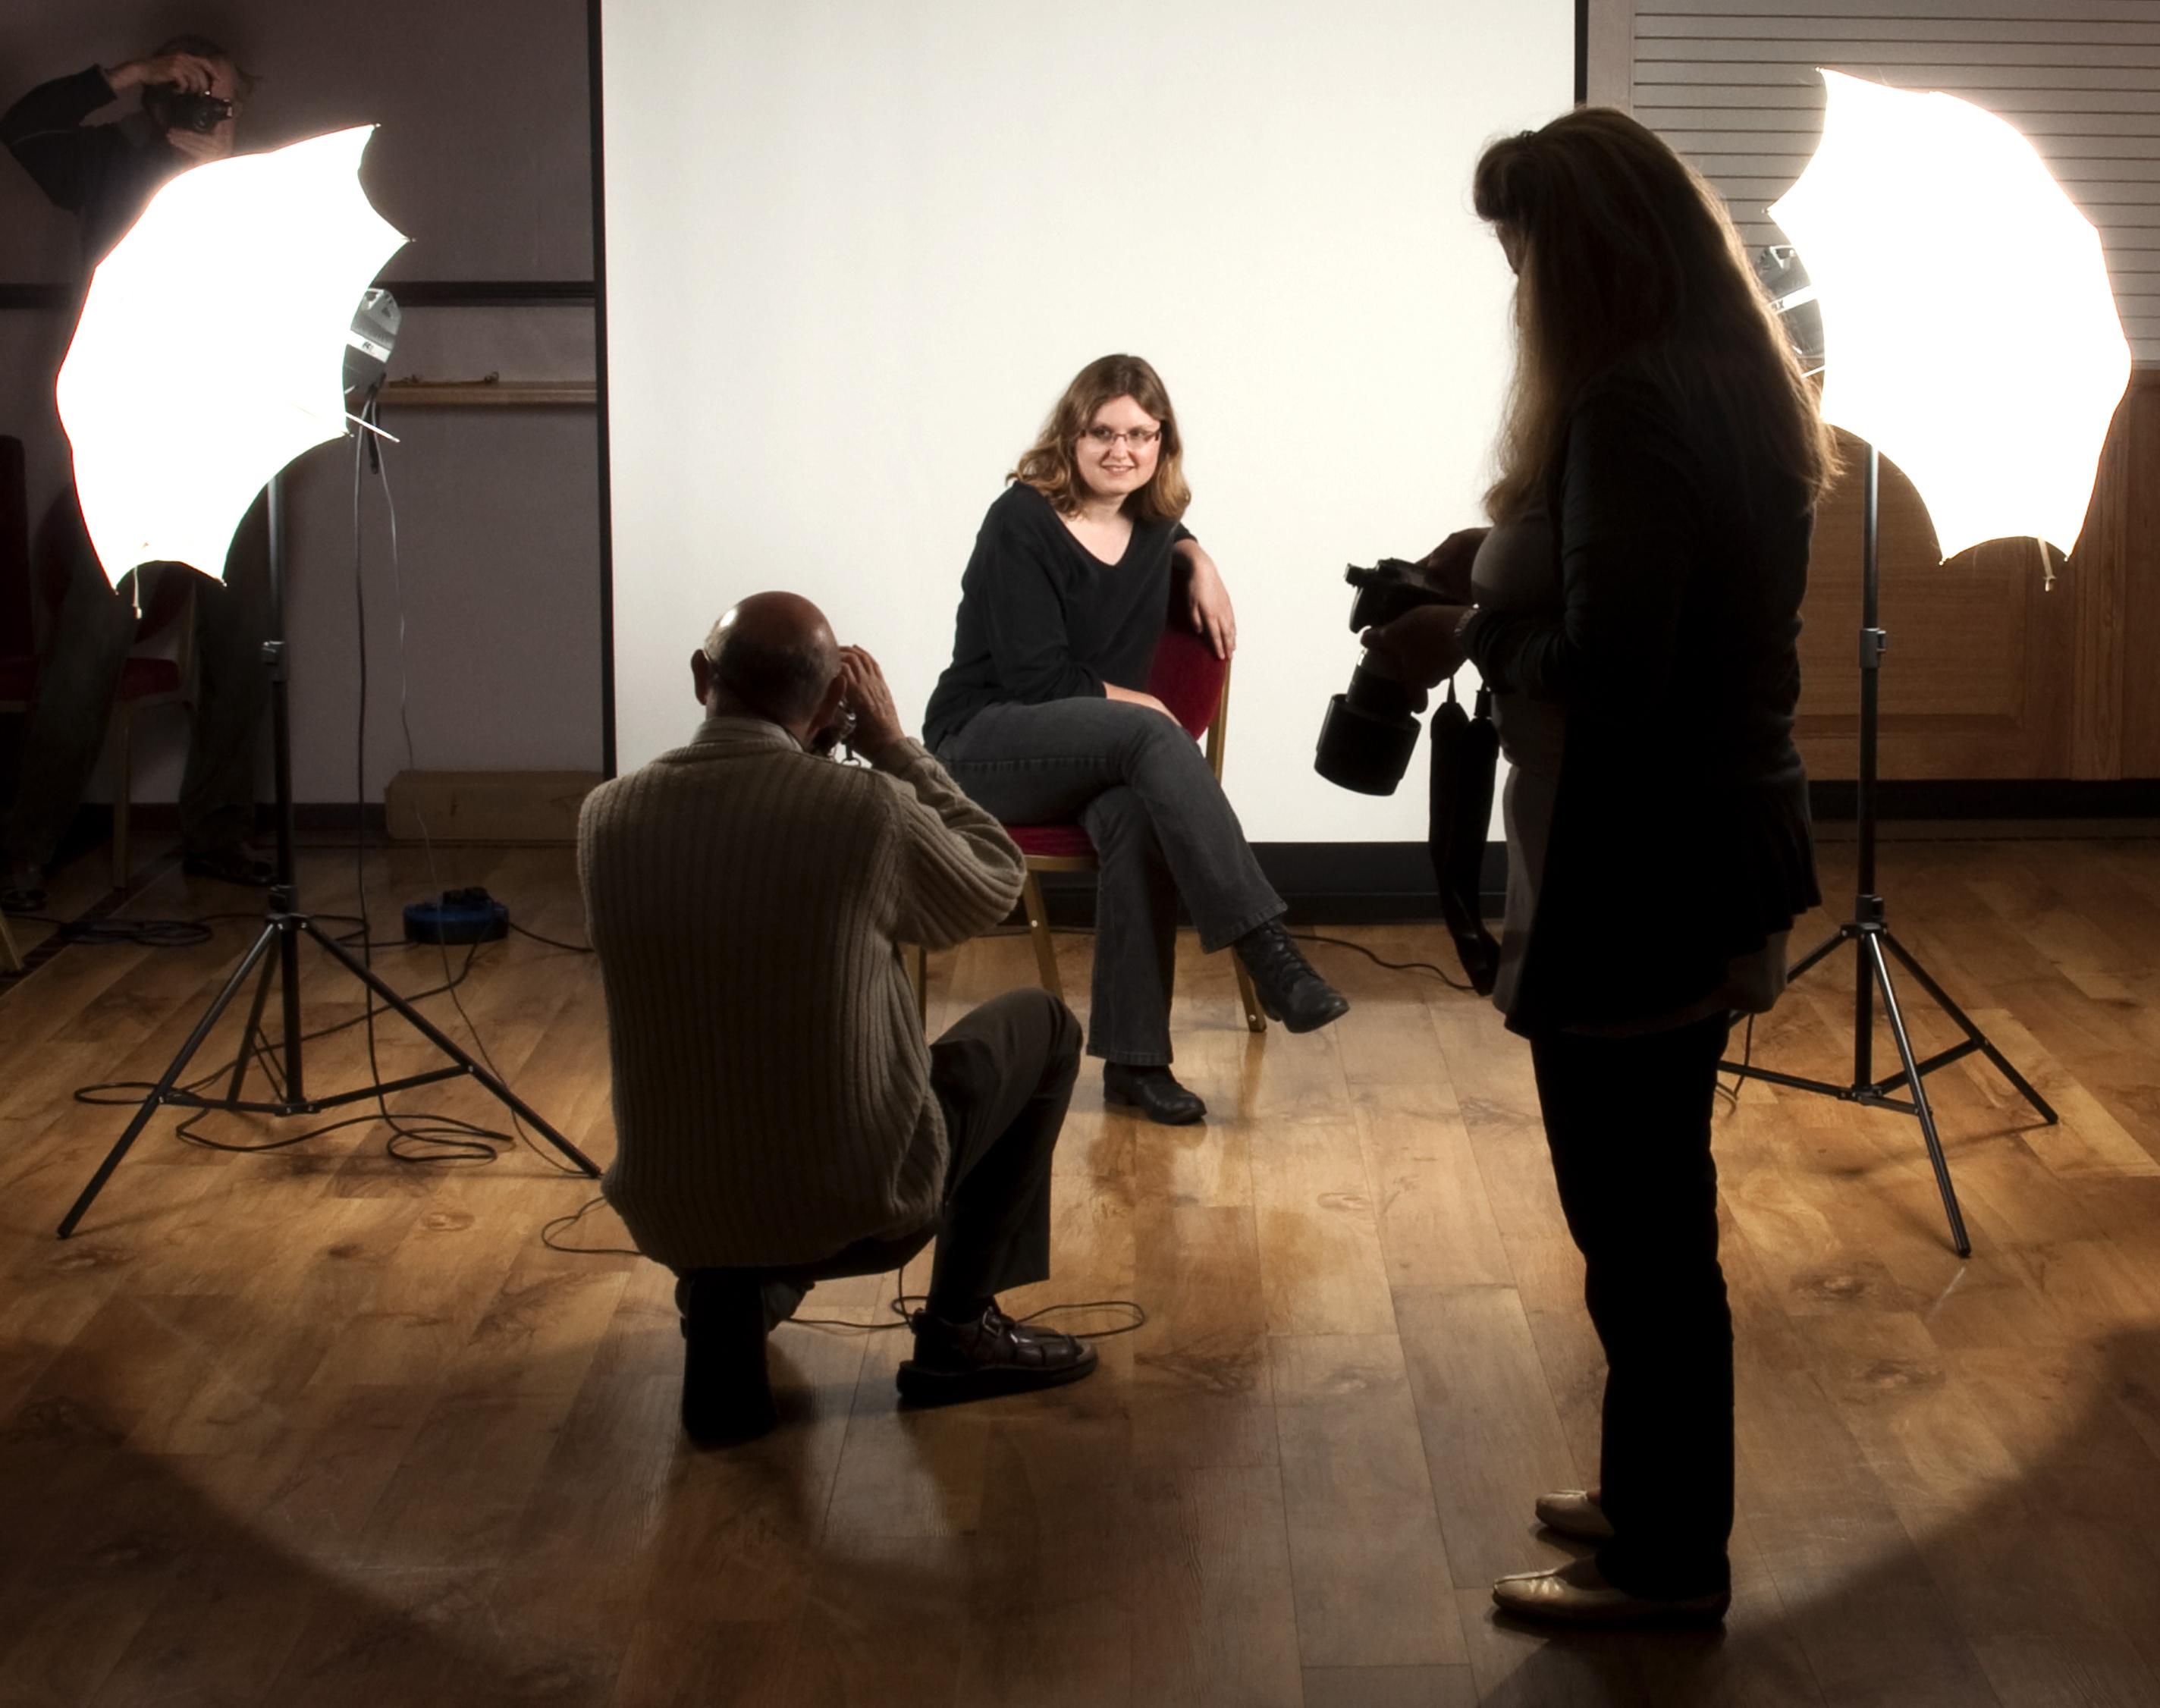 Croxley Camera Club focuses on Rickmansworth